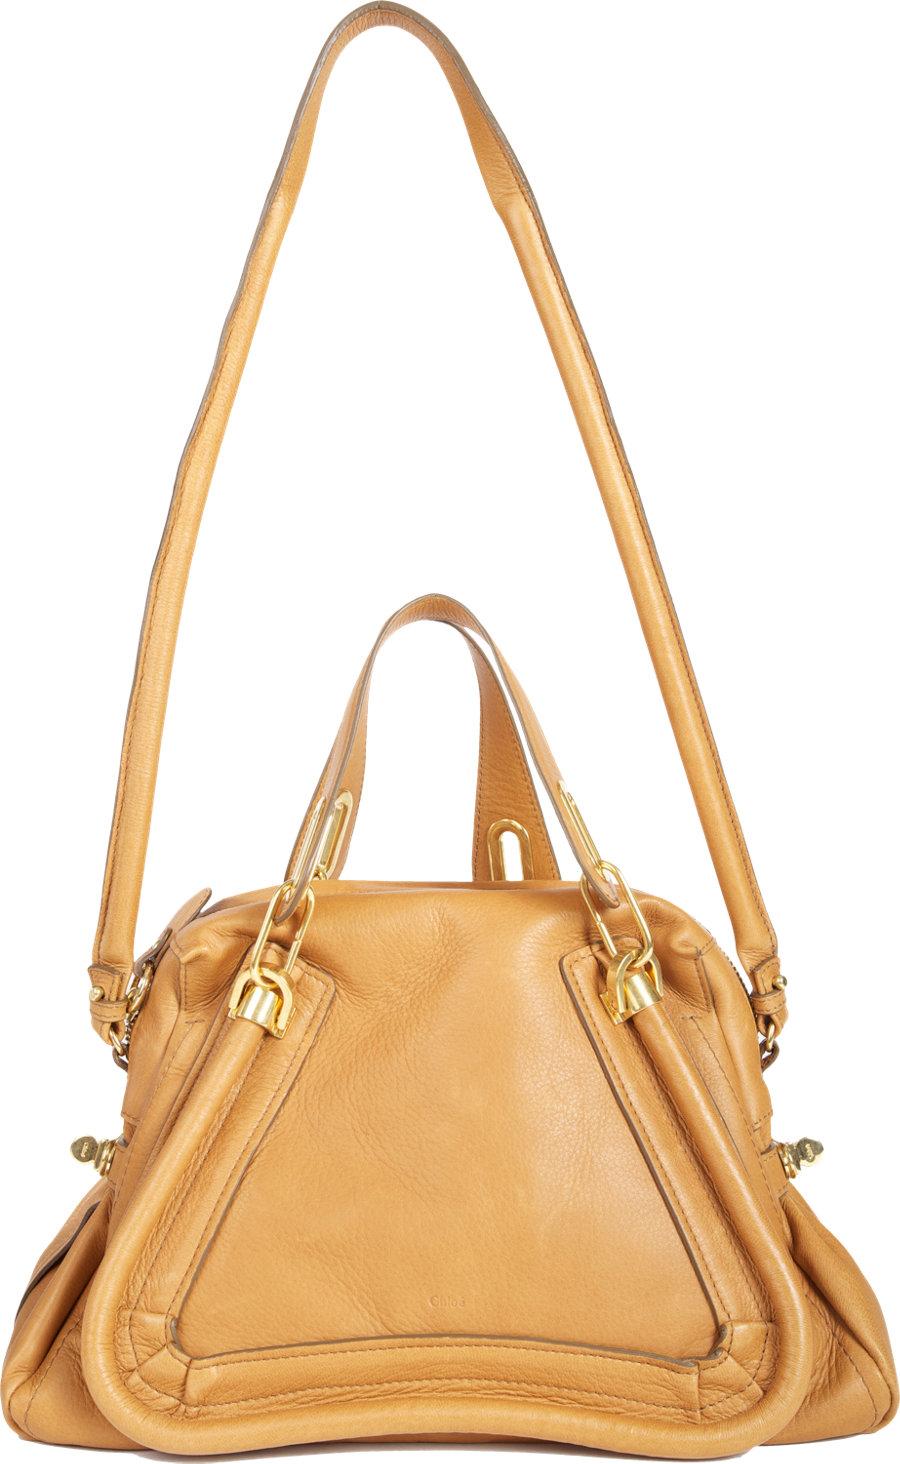 chloe messenger bag marcie - chloe python medium paraty satchel, chloe factory outlet